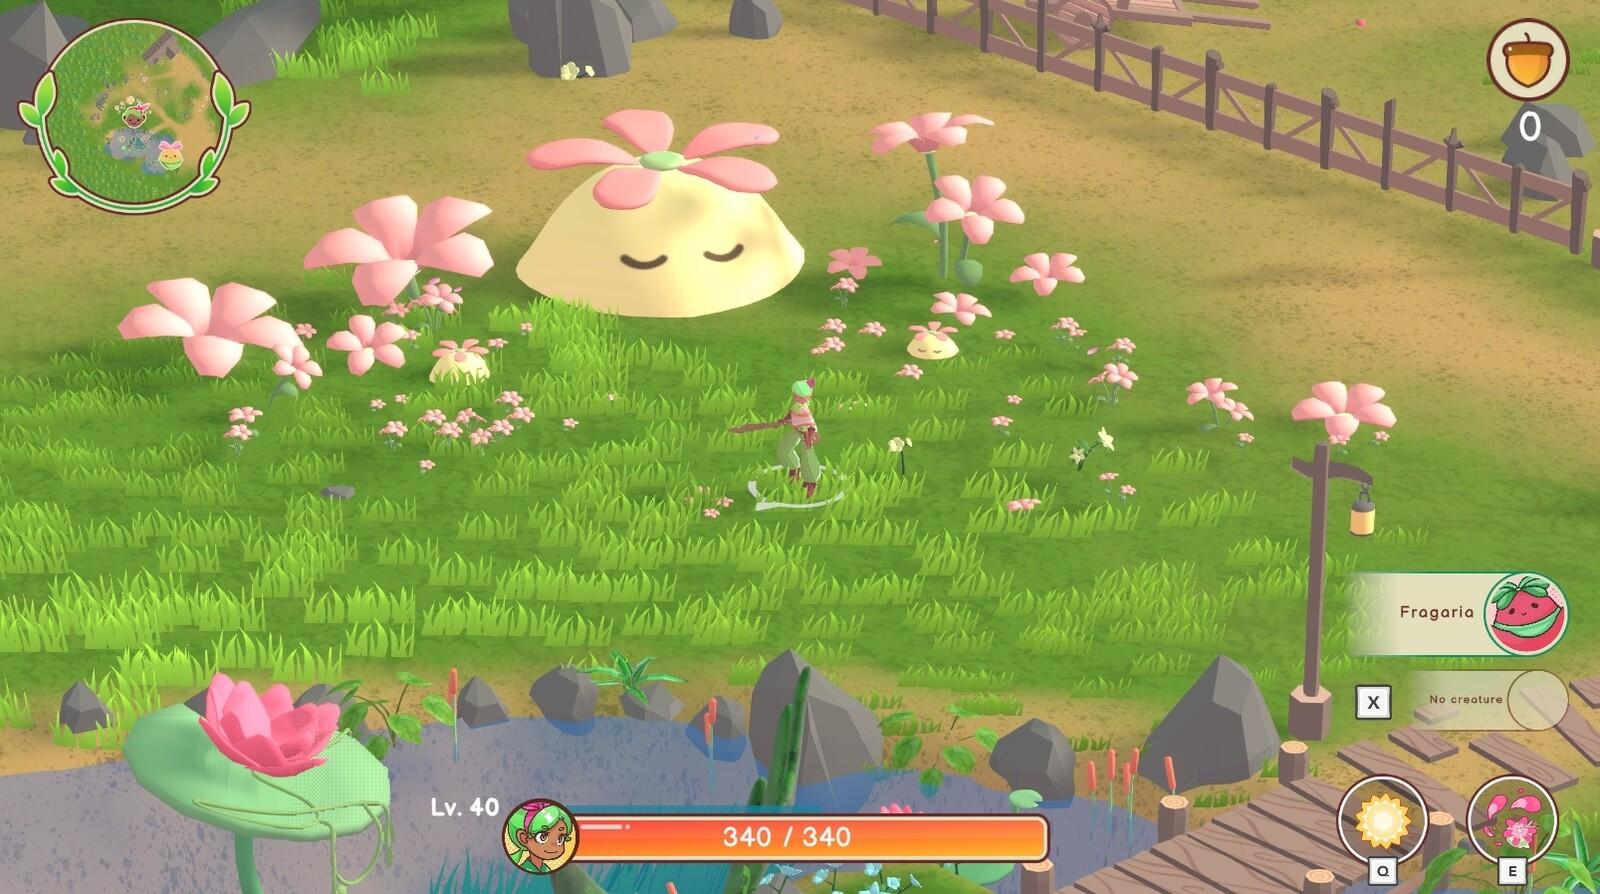 More in game screenshots!